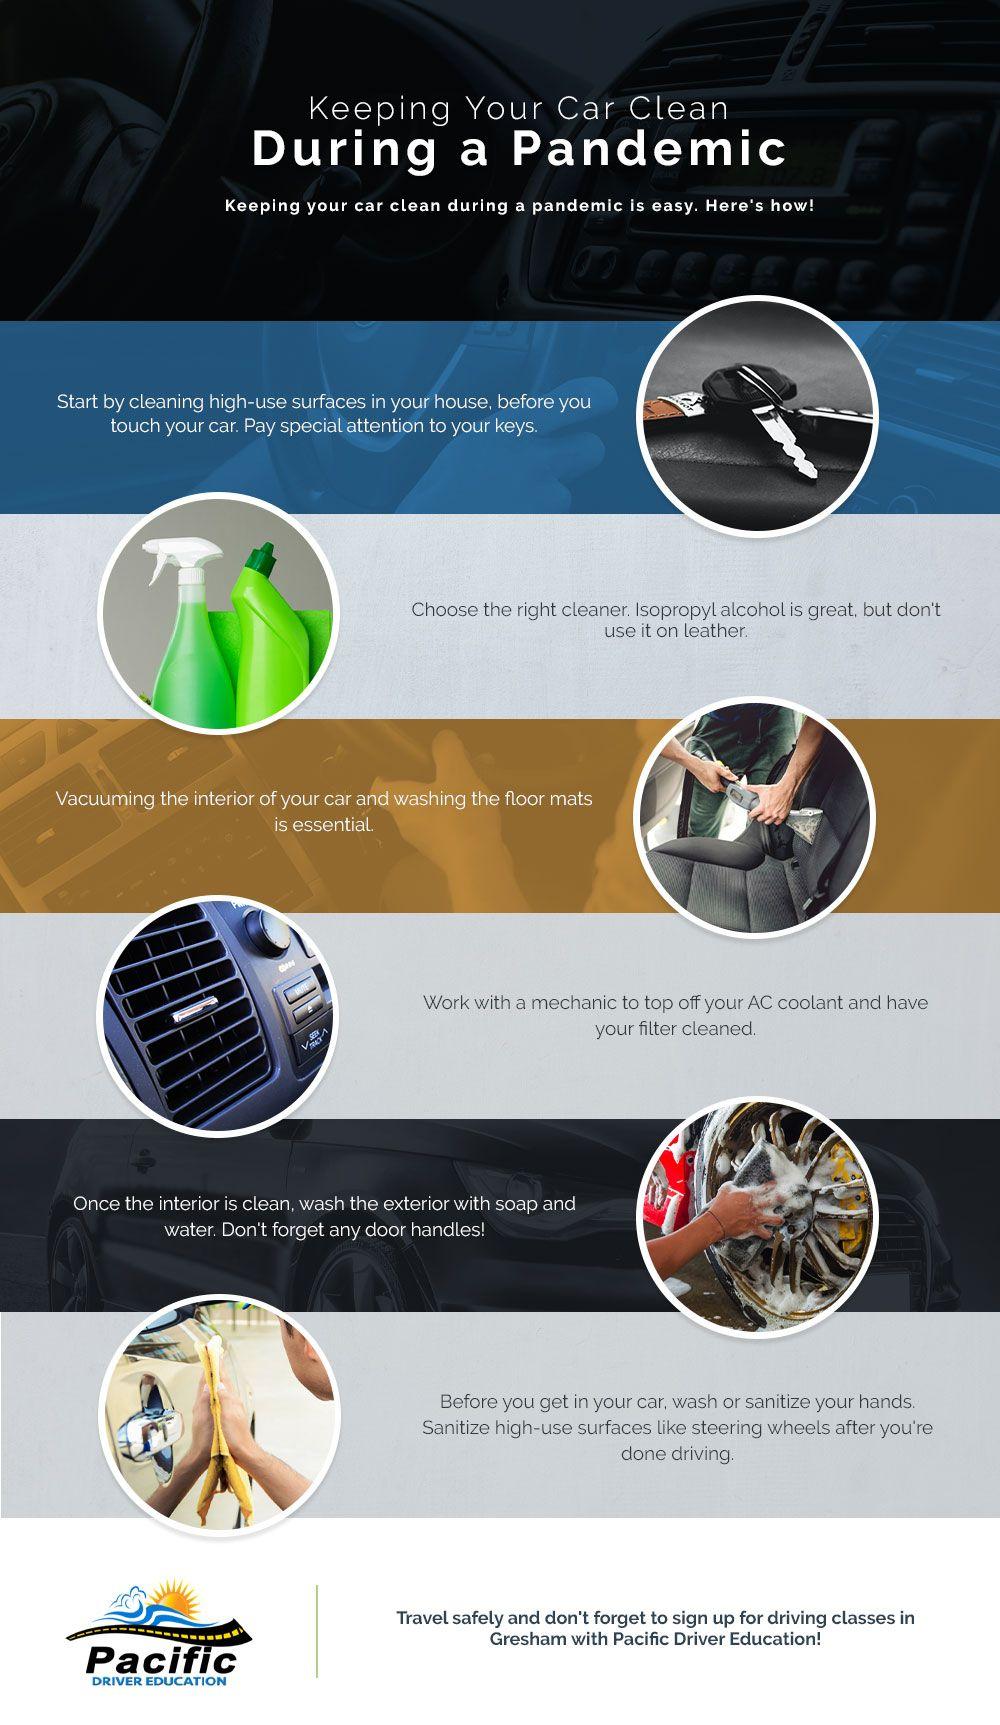 keepingcarclean-infographic-5ebed23146355.jpg